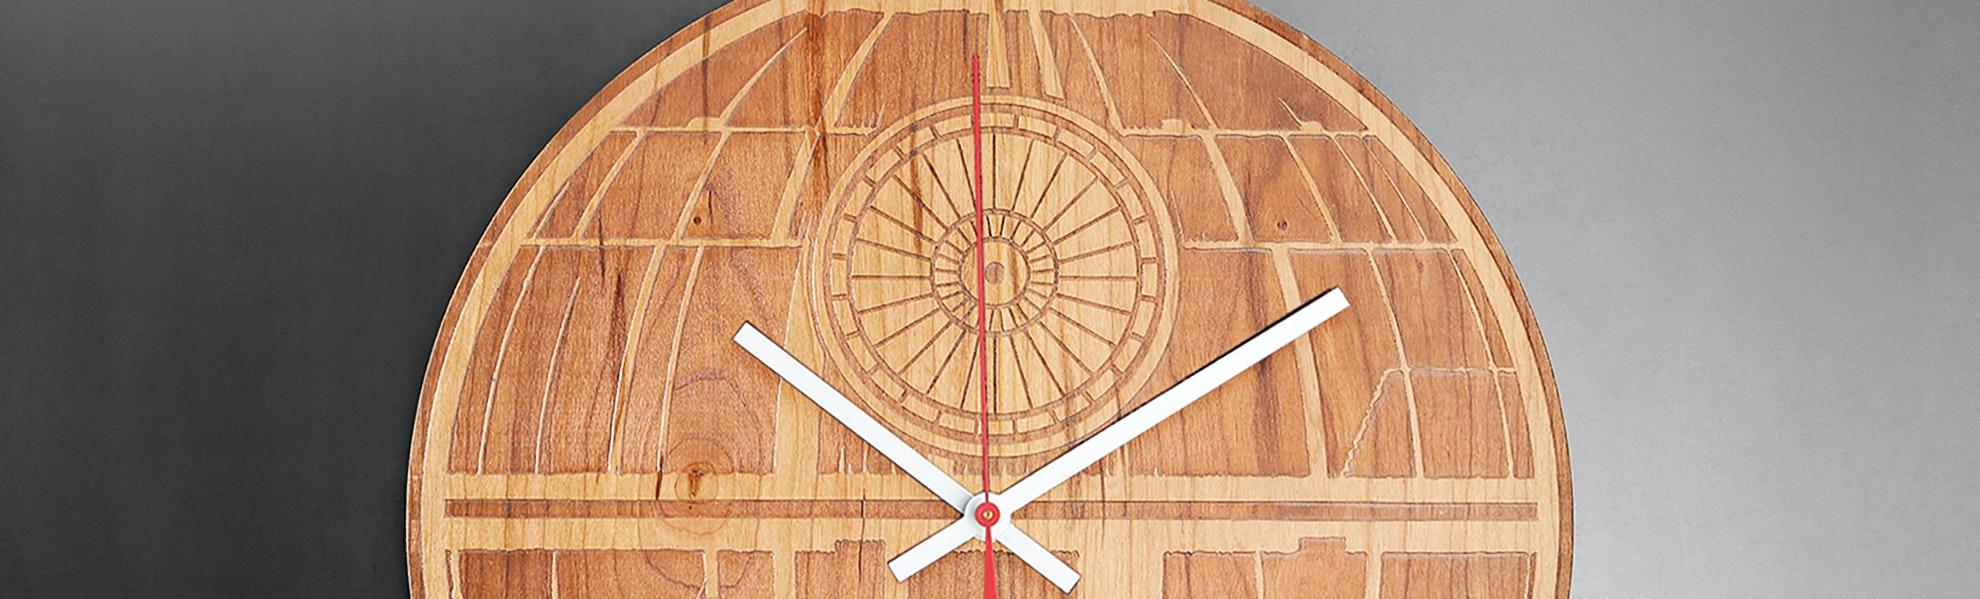 Sci-Fi Laser Engraved Wood Clocks